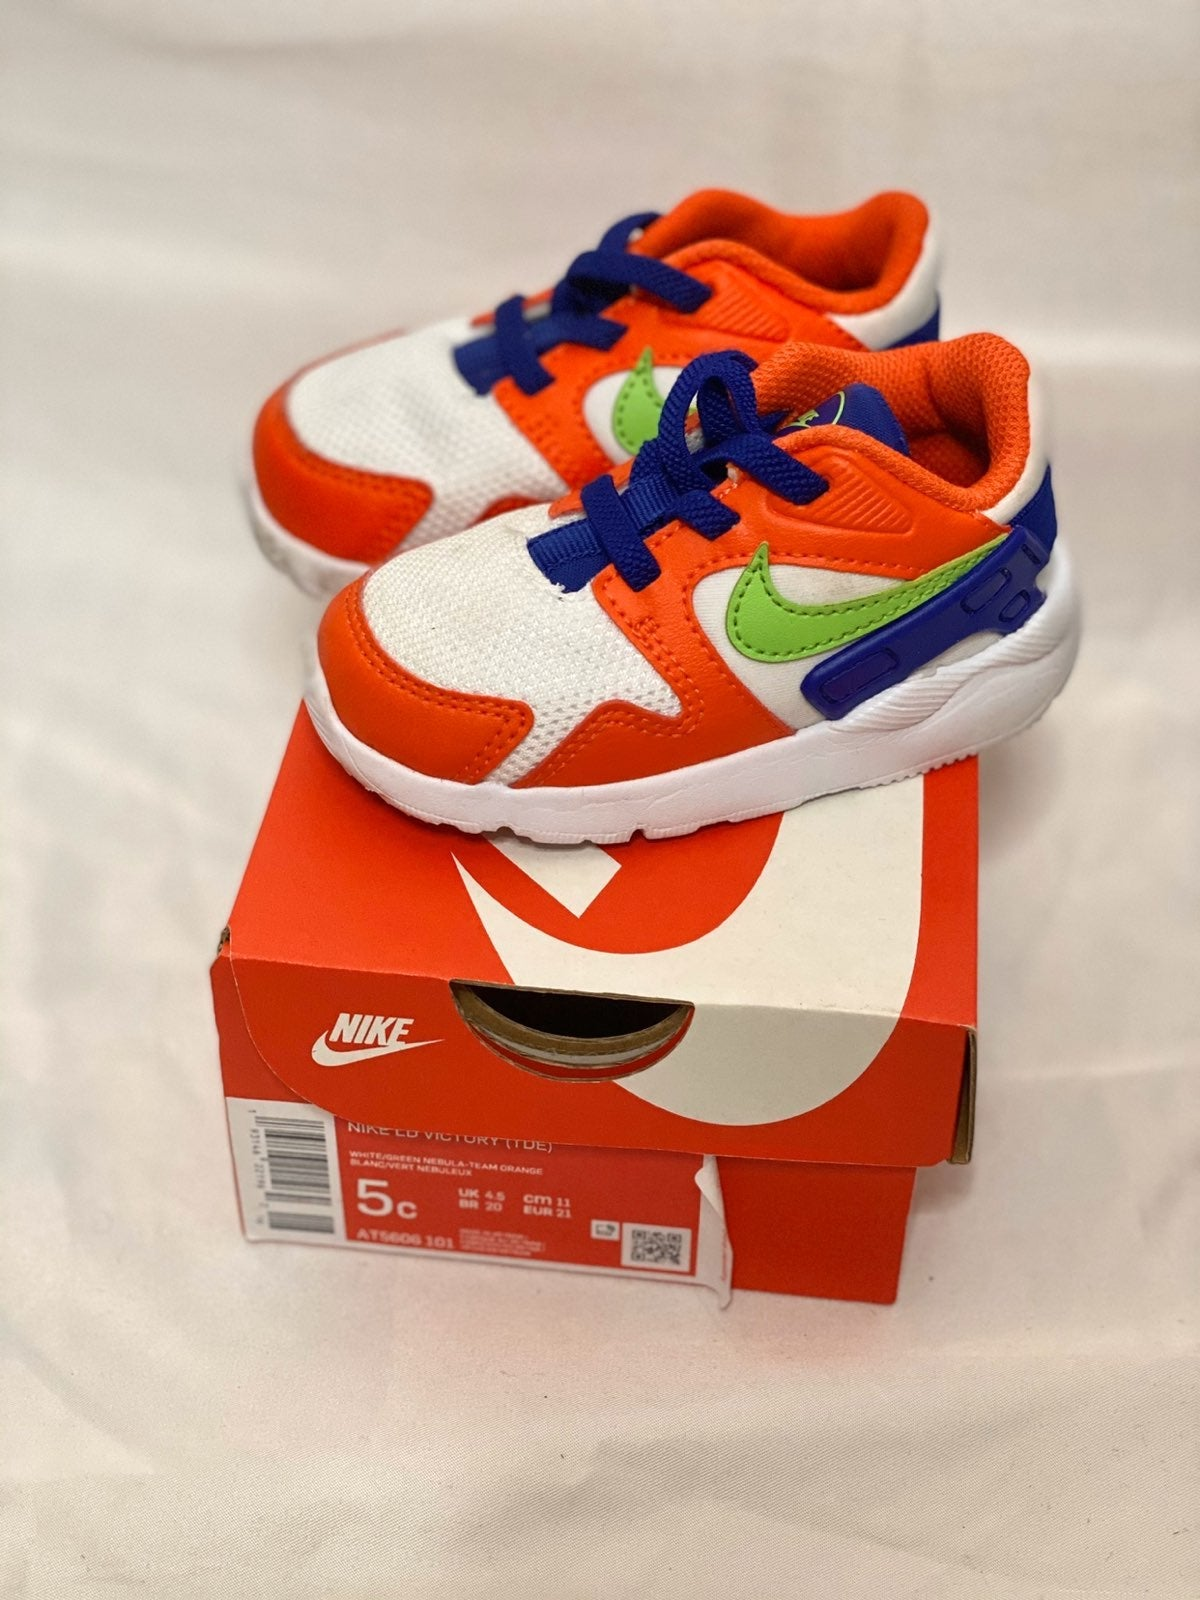 Nike LD Victory (TDE) Size 5C